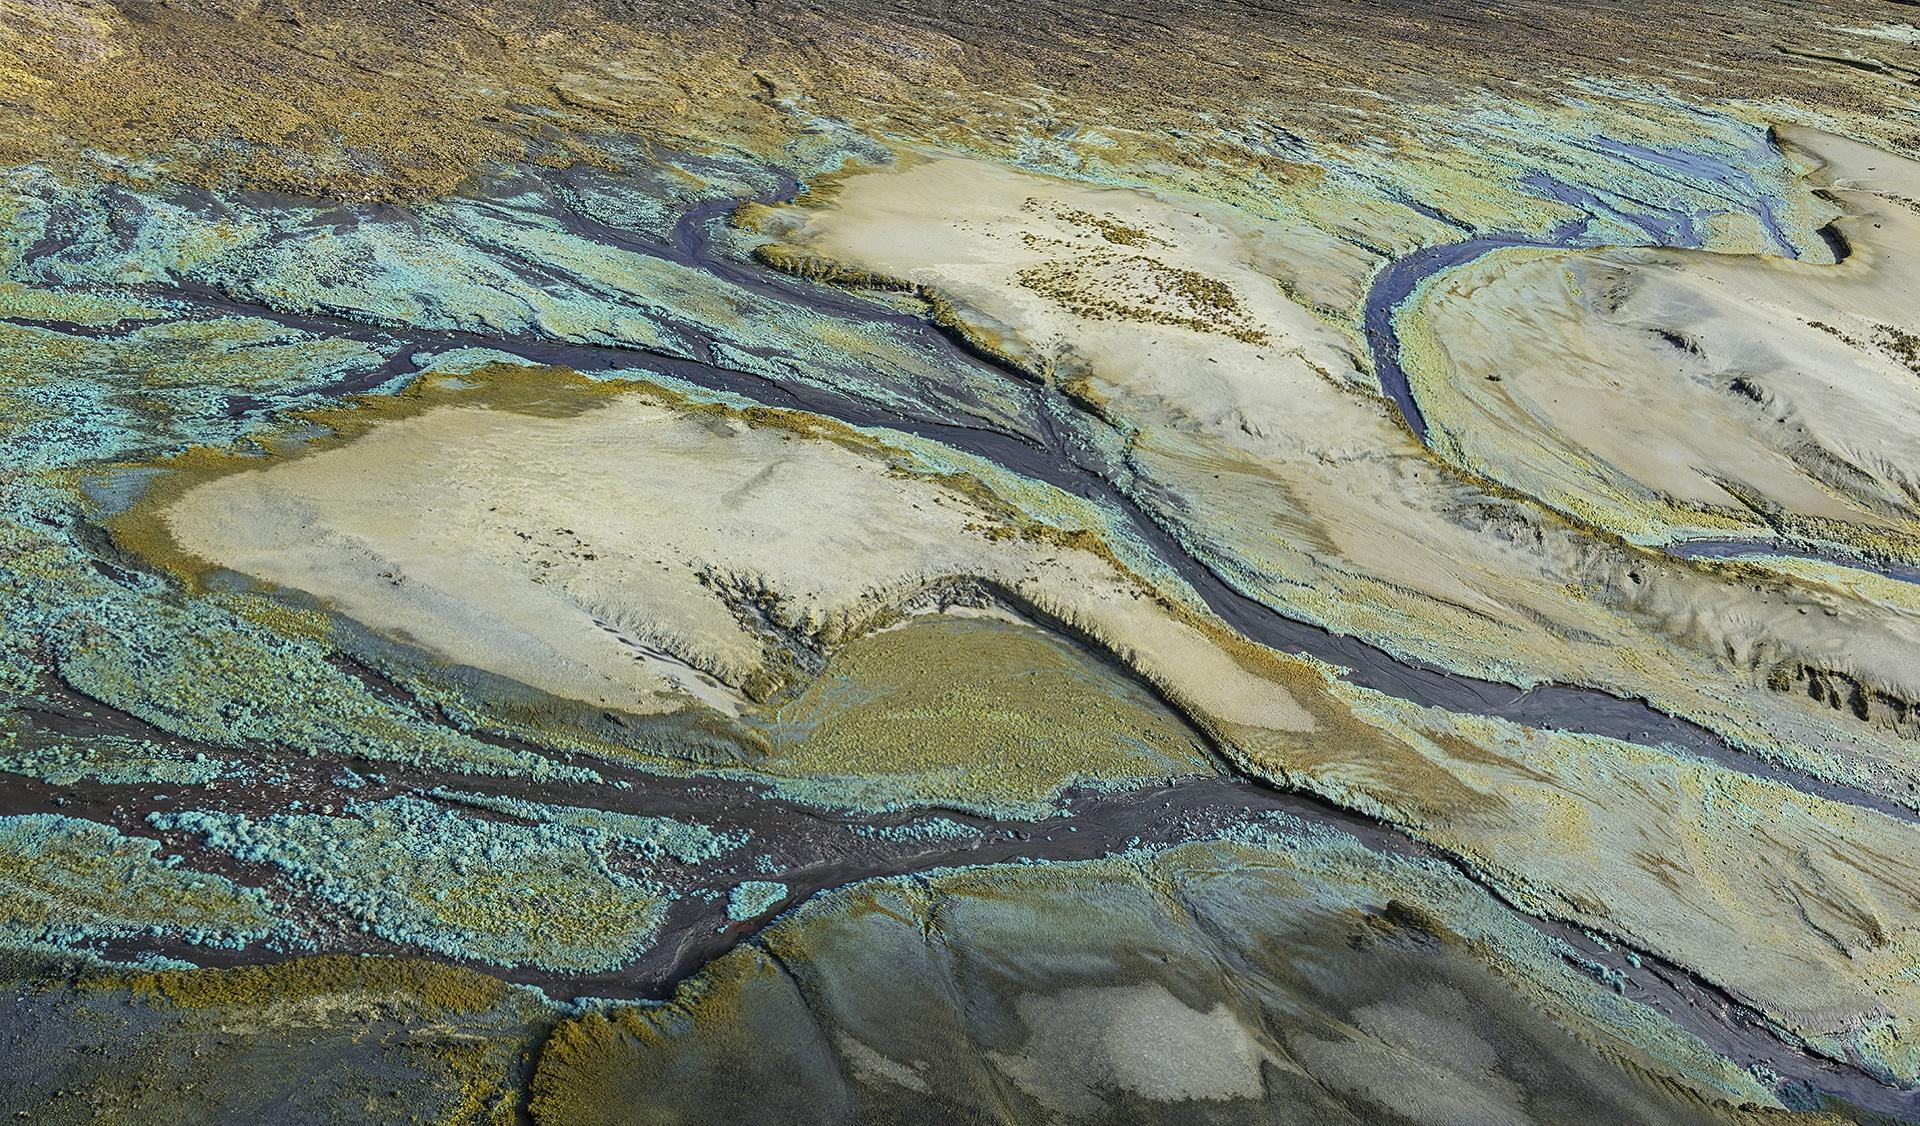 Río Tinto - Sulfuric Art - Peter Manschot Al Andalus Photo Tour, Landscape photography photos prints workshops Andalusia Spain